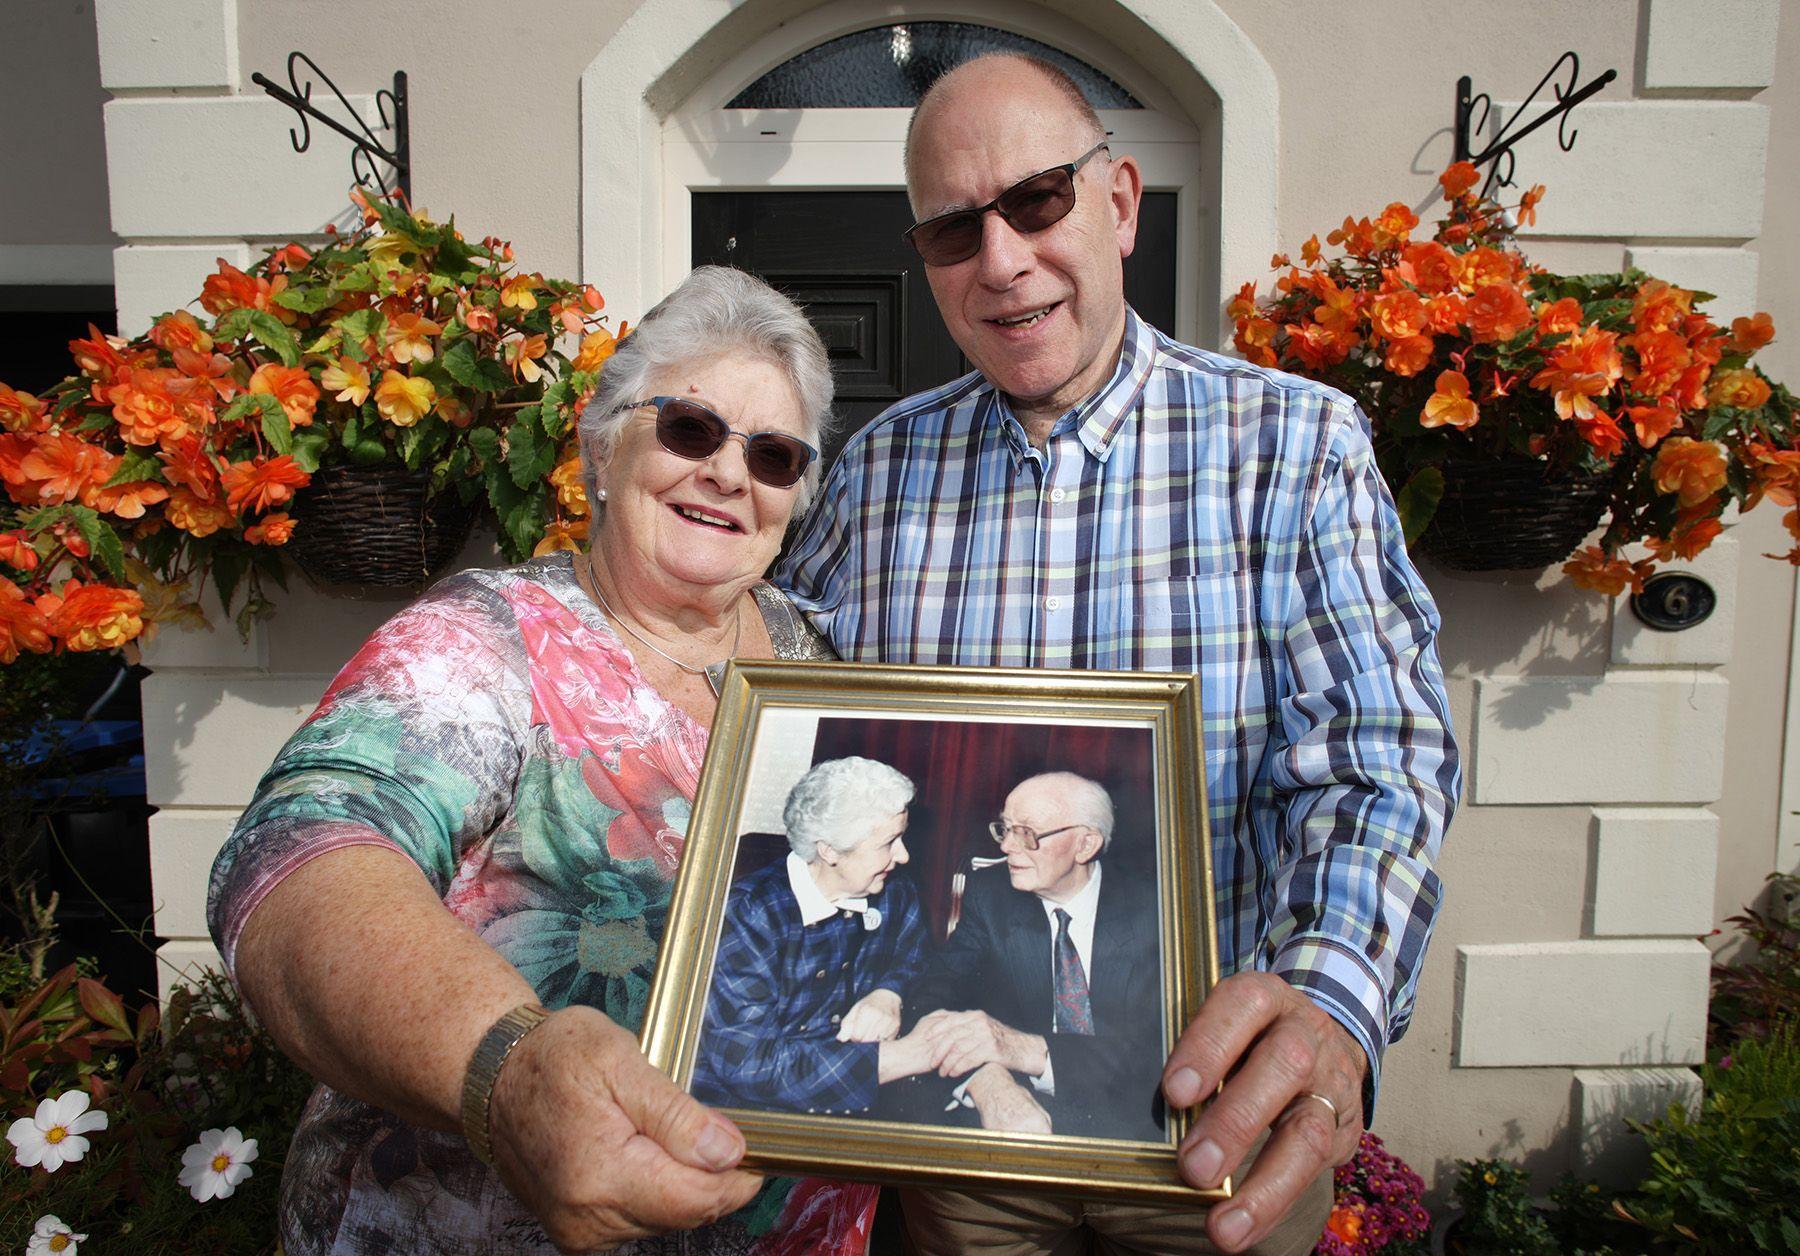 MEMORIES: Helen McKelvey and her husband, Reverend Derek McKelvey, with a treasured family portrait of Reverend Wilbur Gillespie and his wife Edna